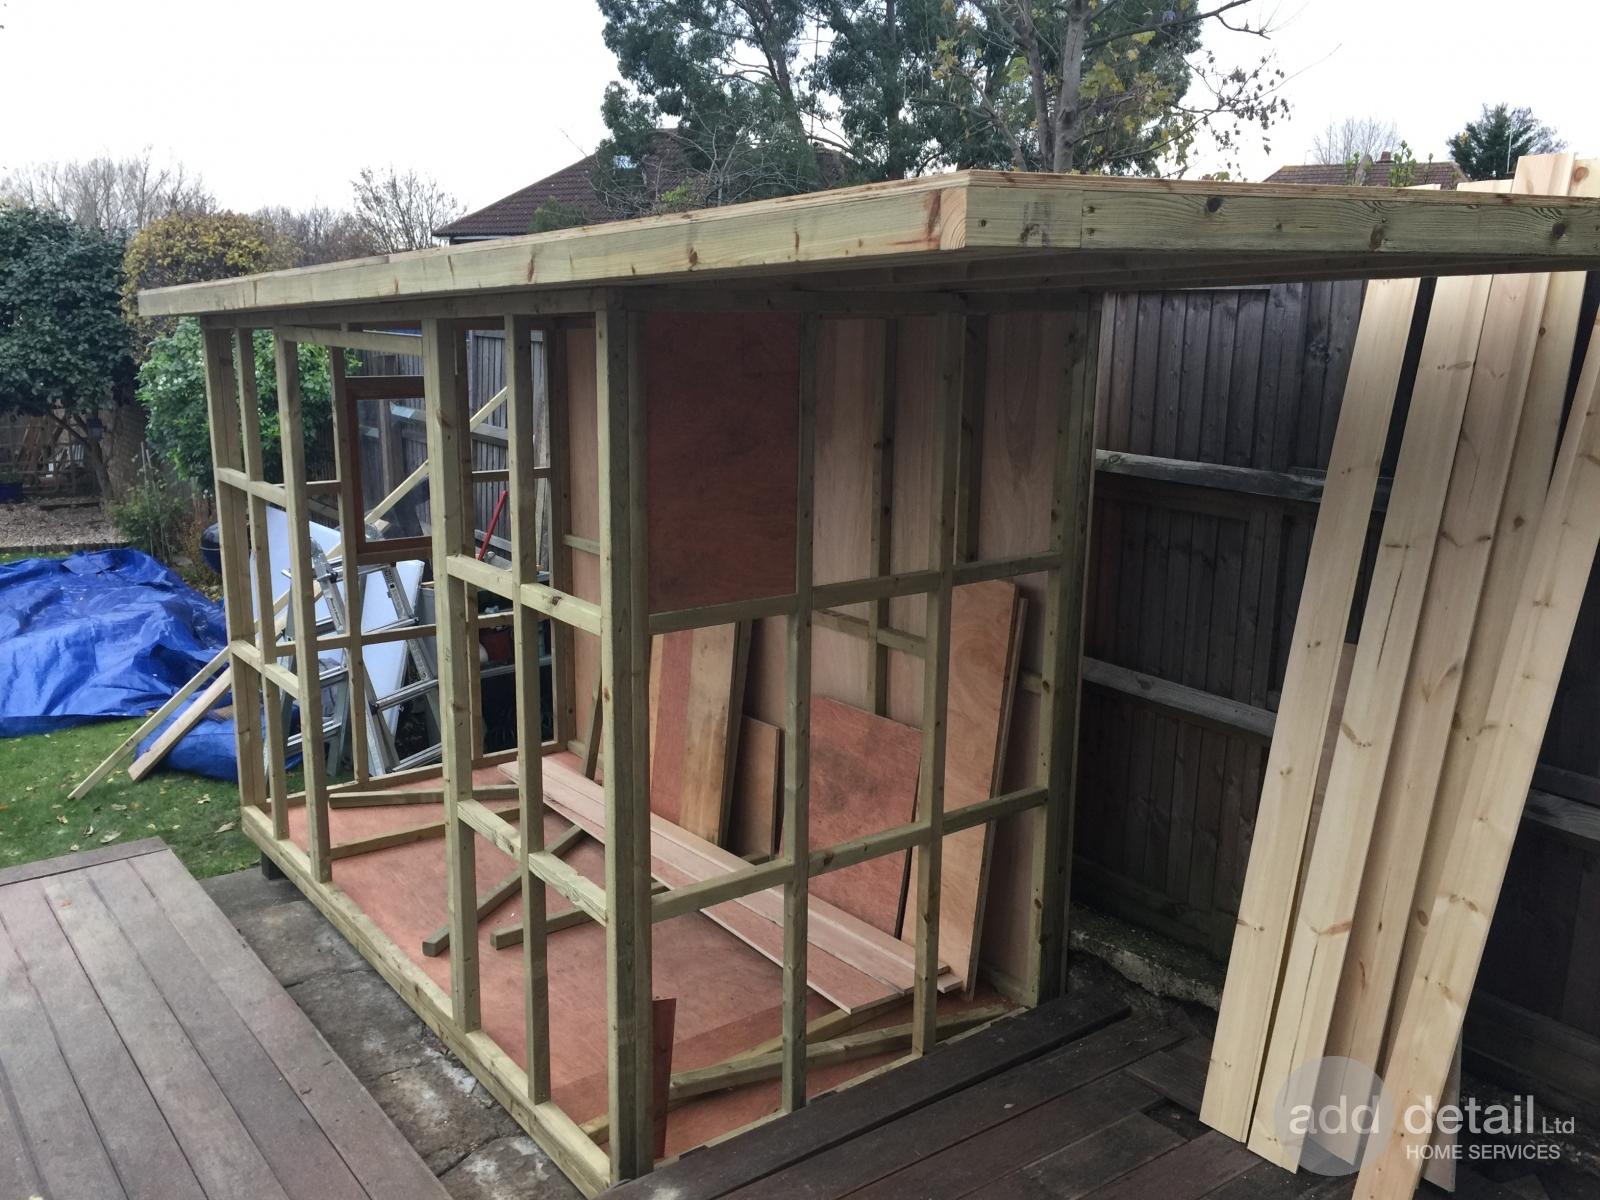 Gallery bespoke garden shed north london london for Bespoke garden sheds